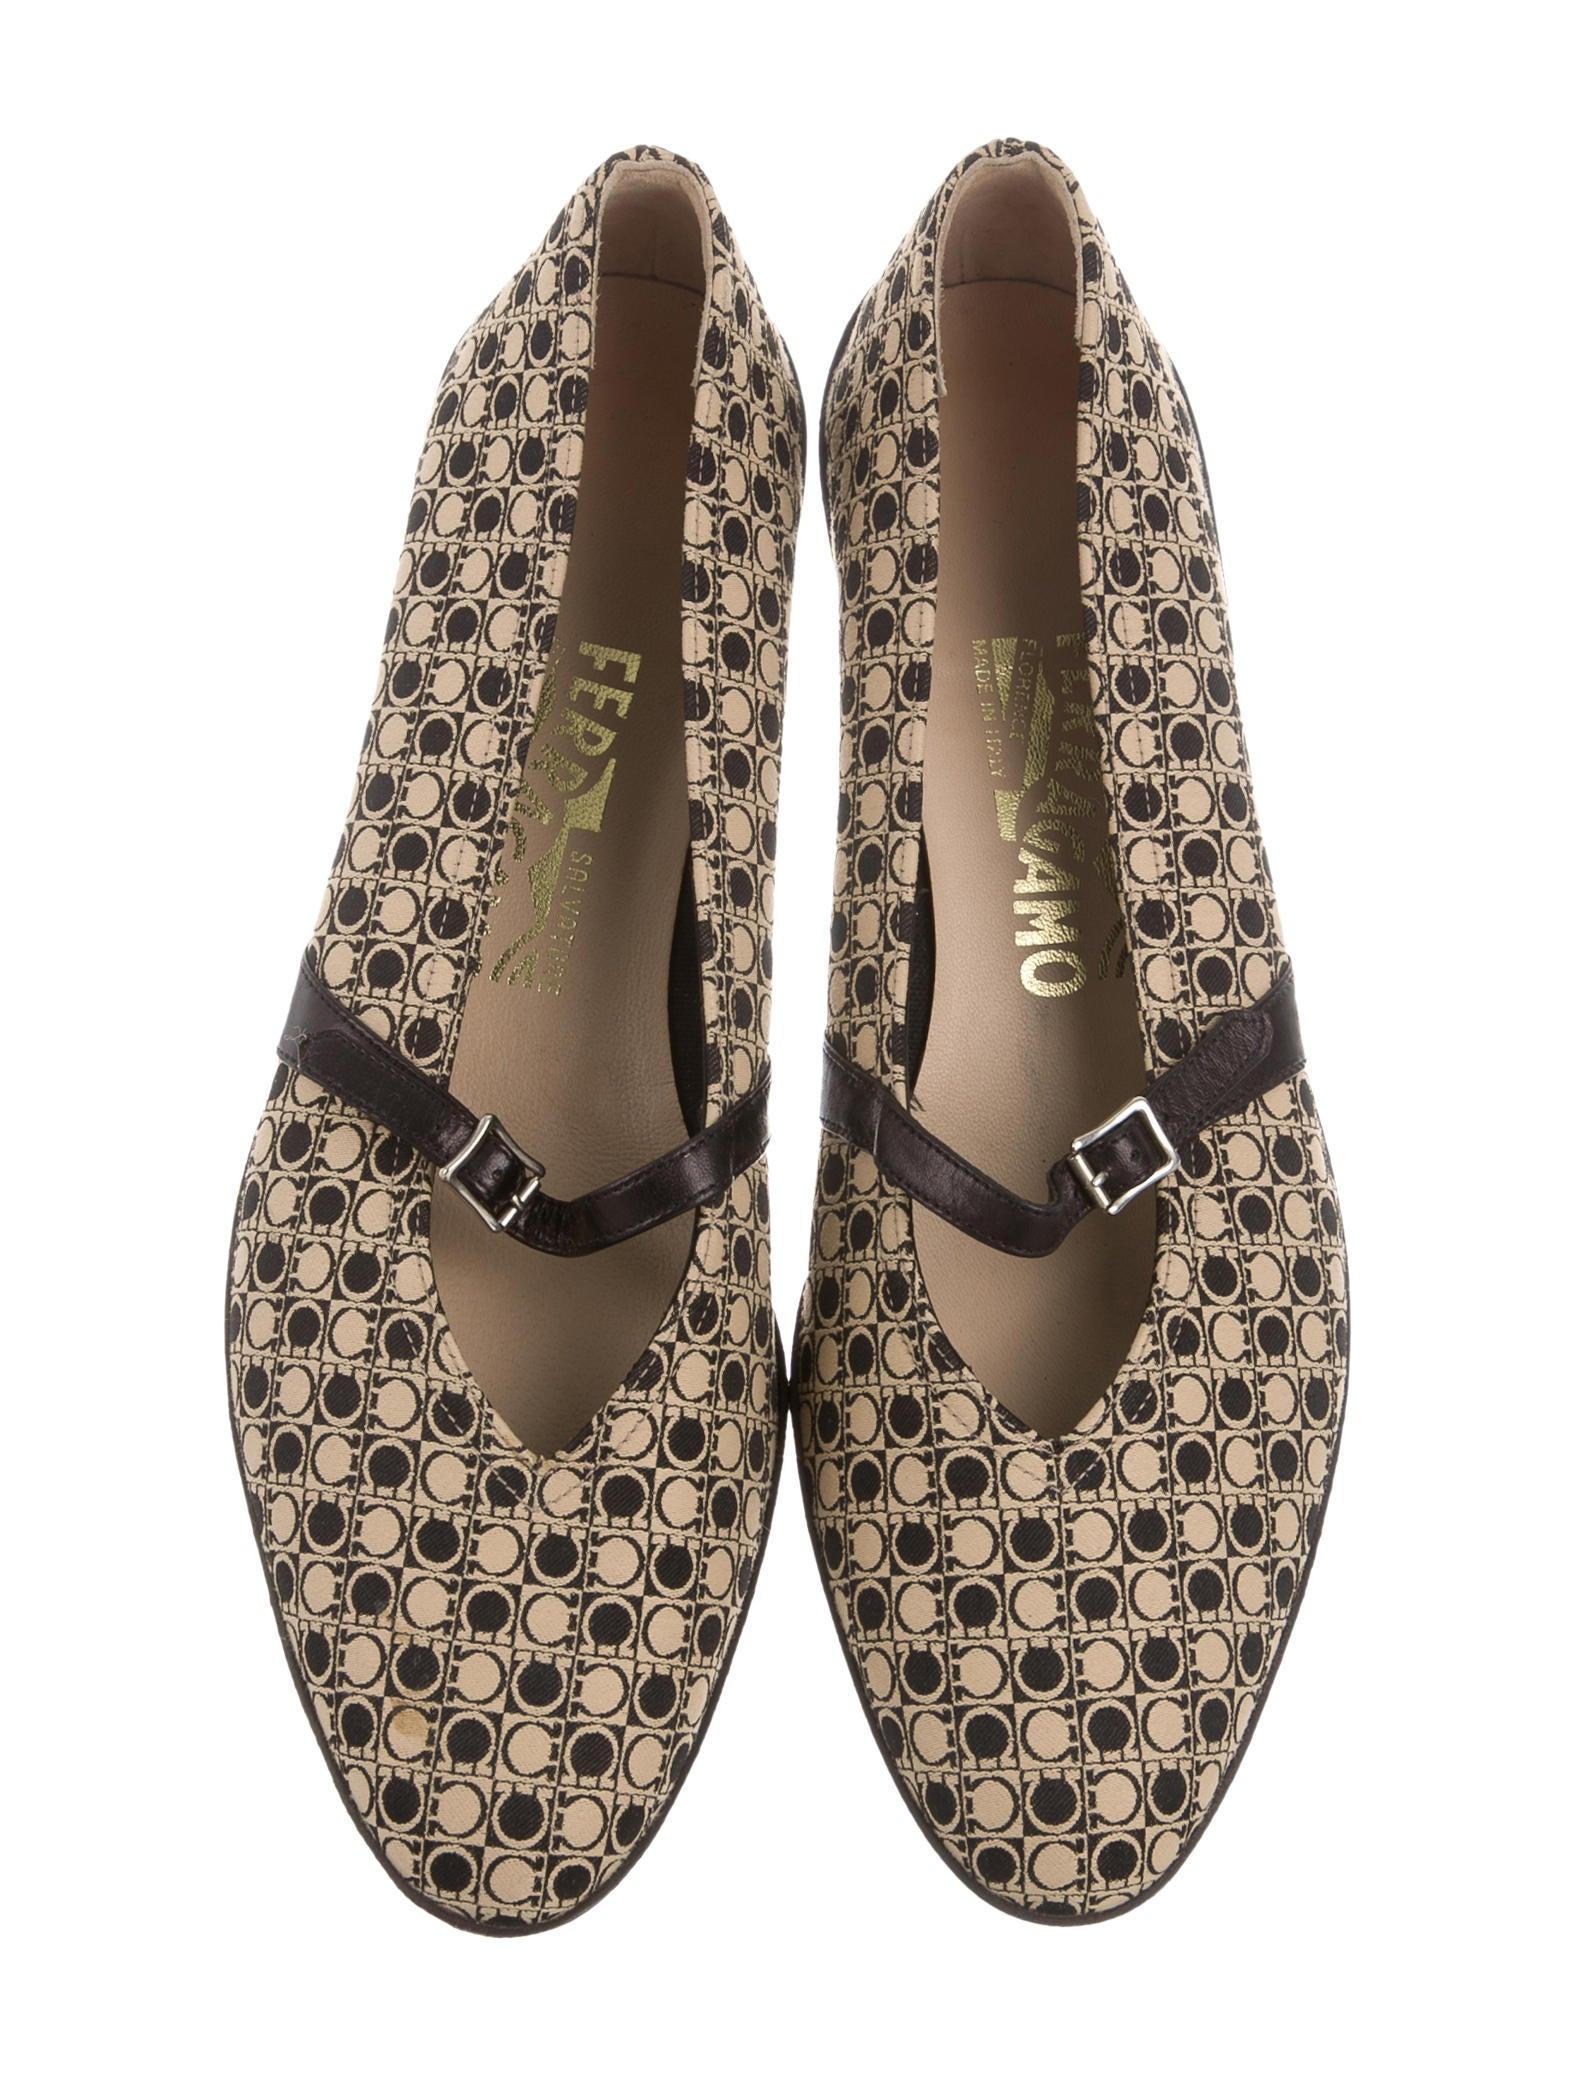 Salvatore Ferragamo Mary Jane Black Shoes